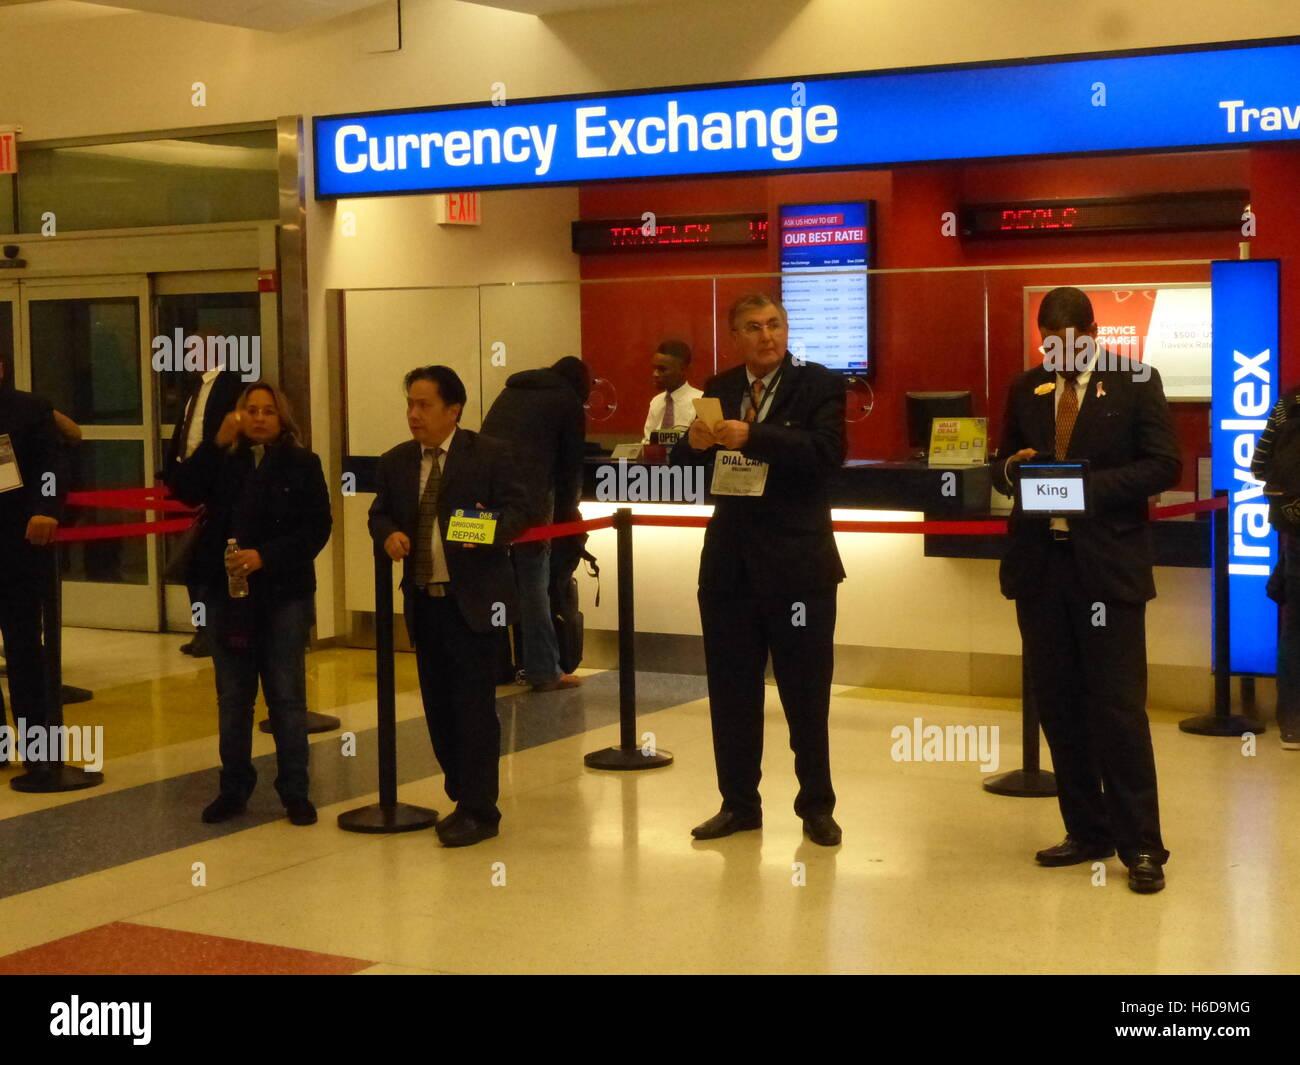 currency exchange jfk airport stock photos currency exchange jfk